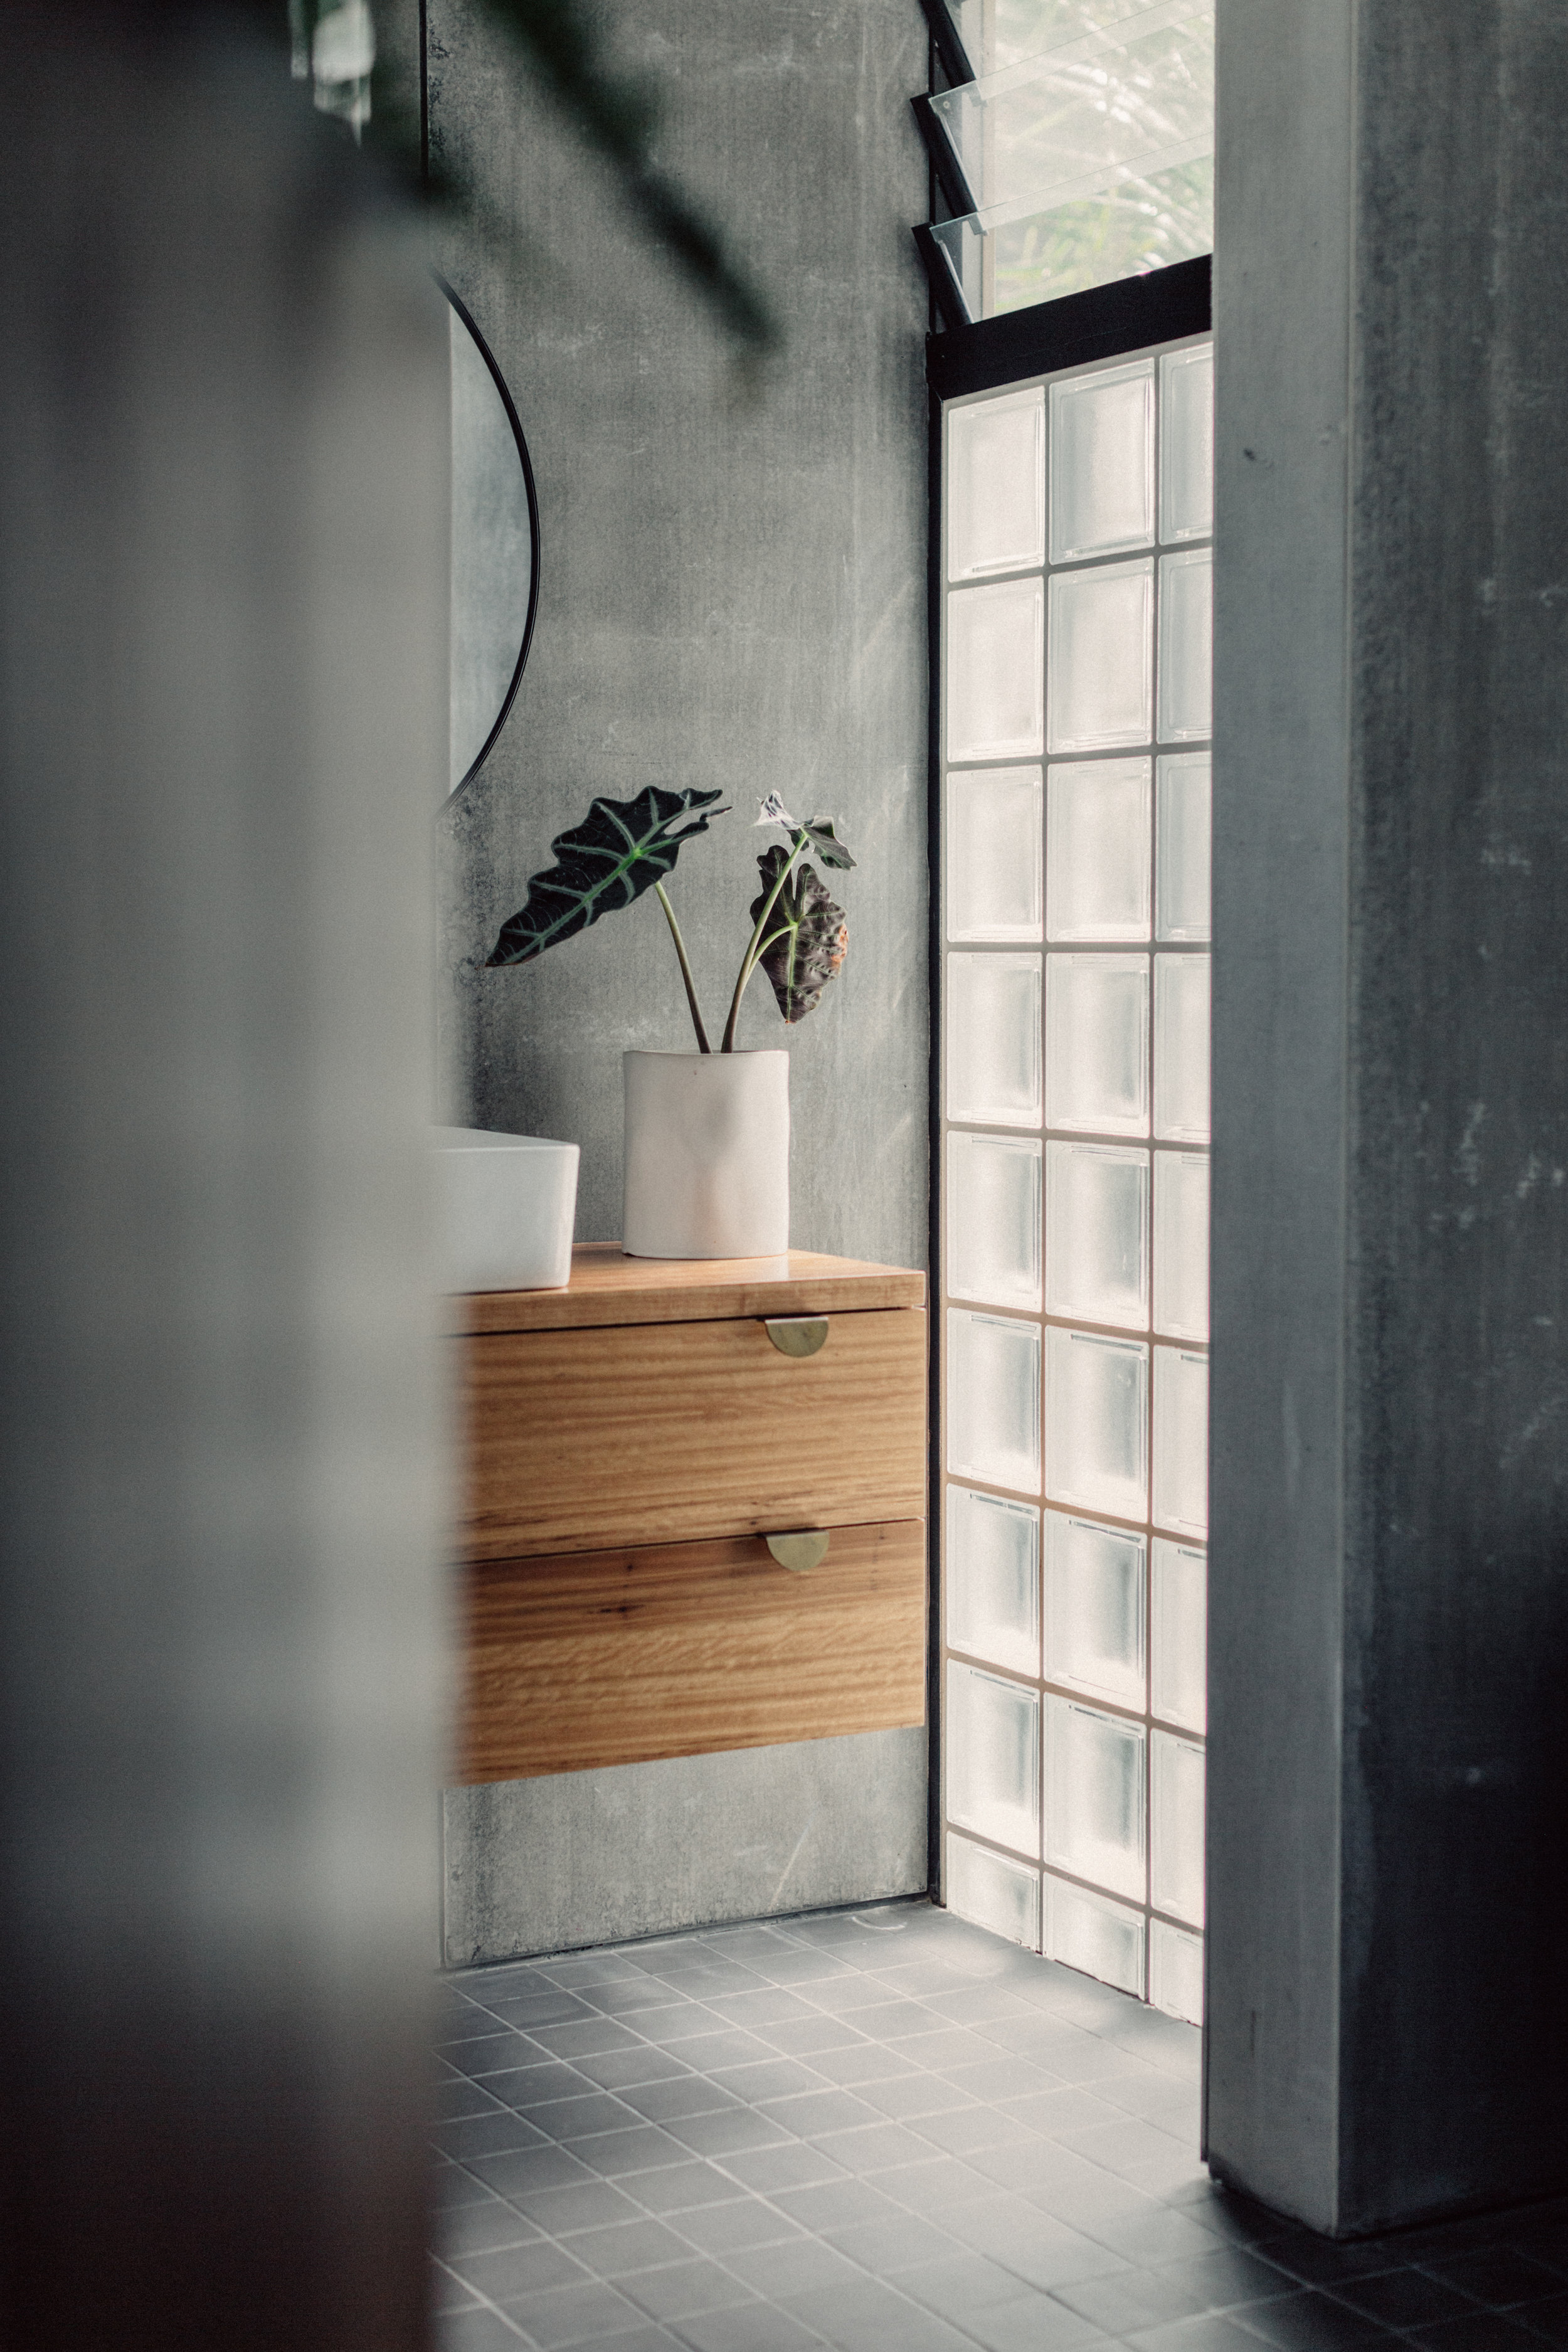 Takt Coledale Blade House bathroom glass blocks.jpg